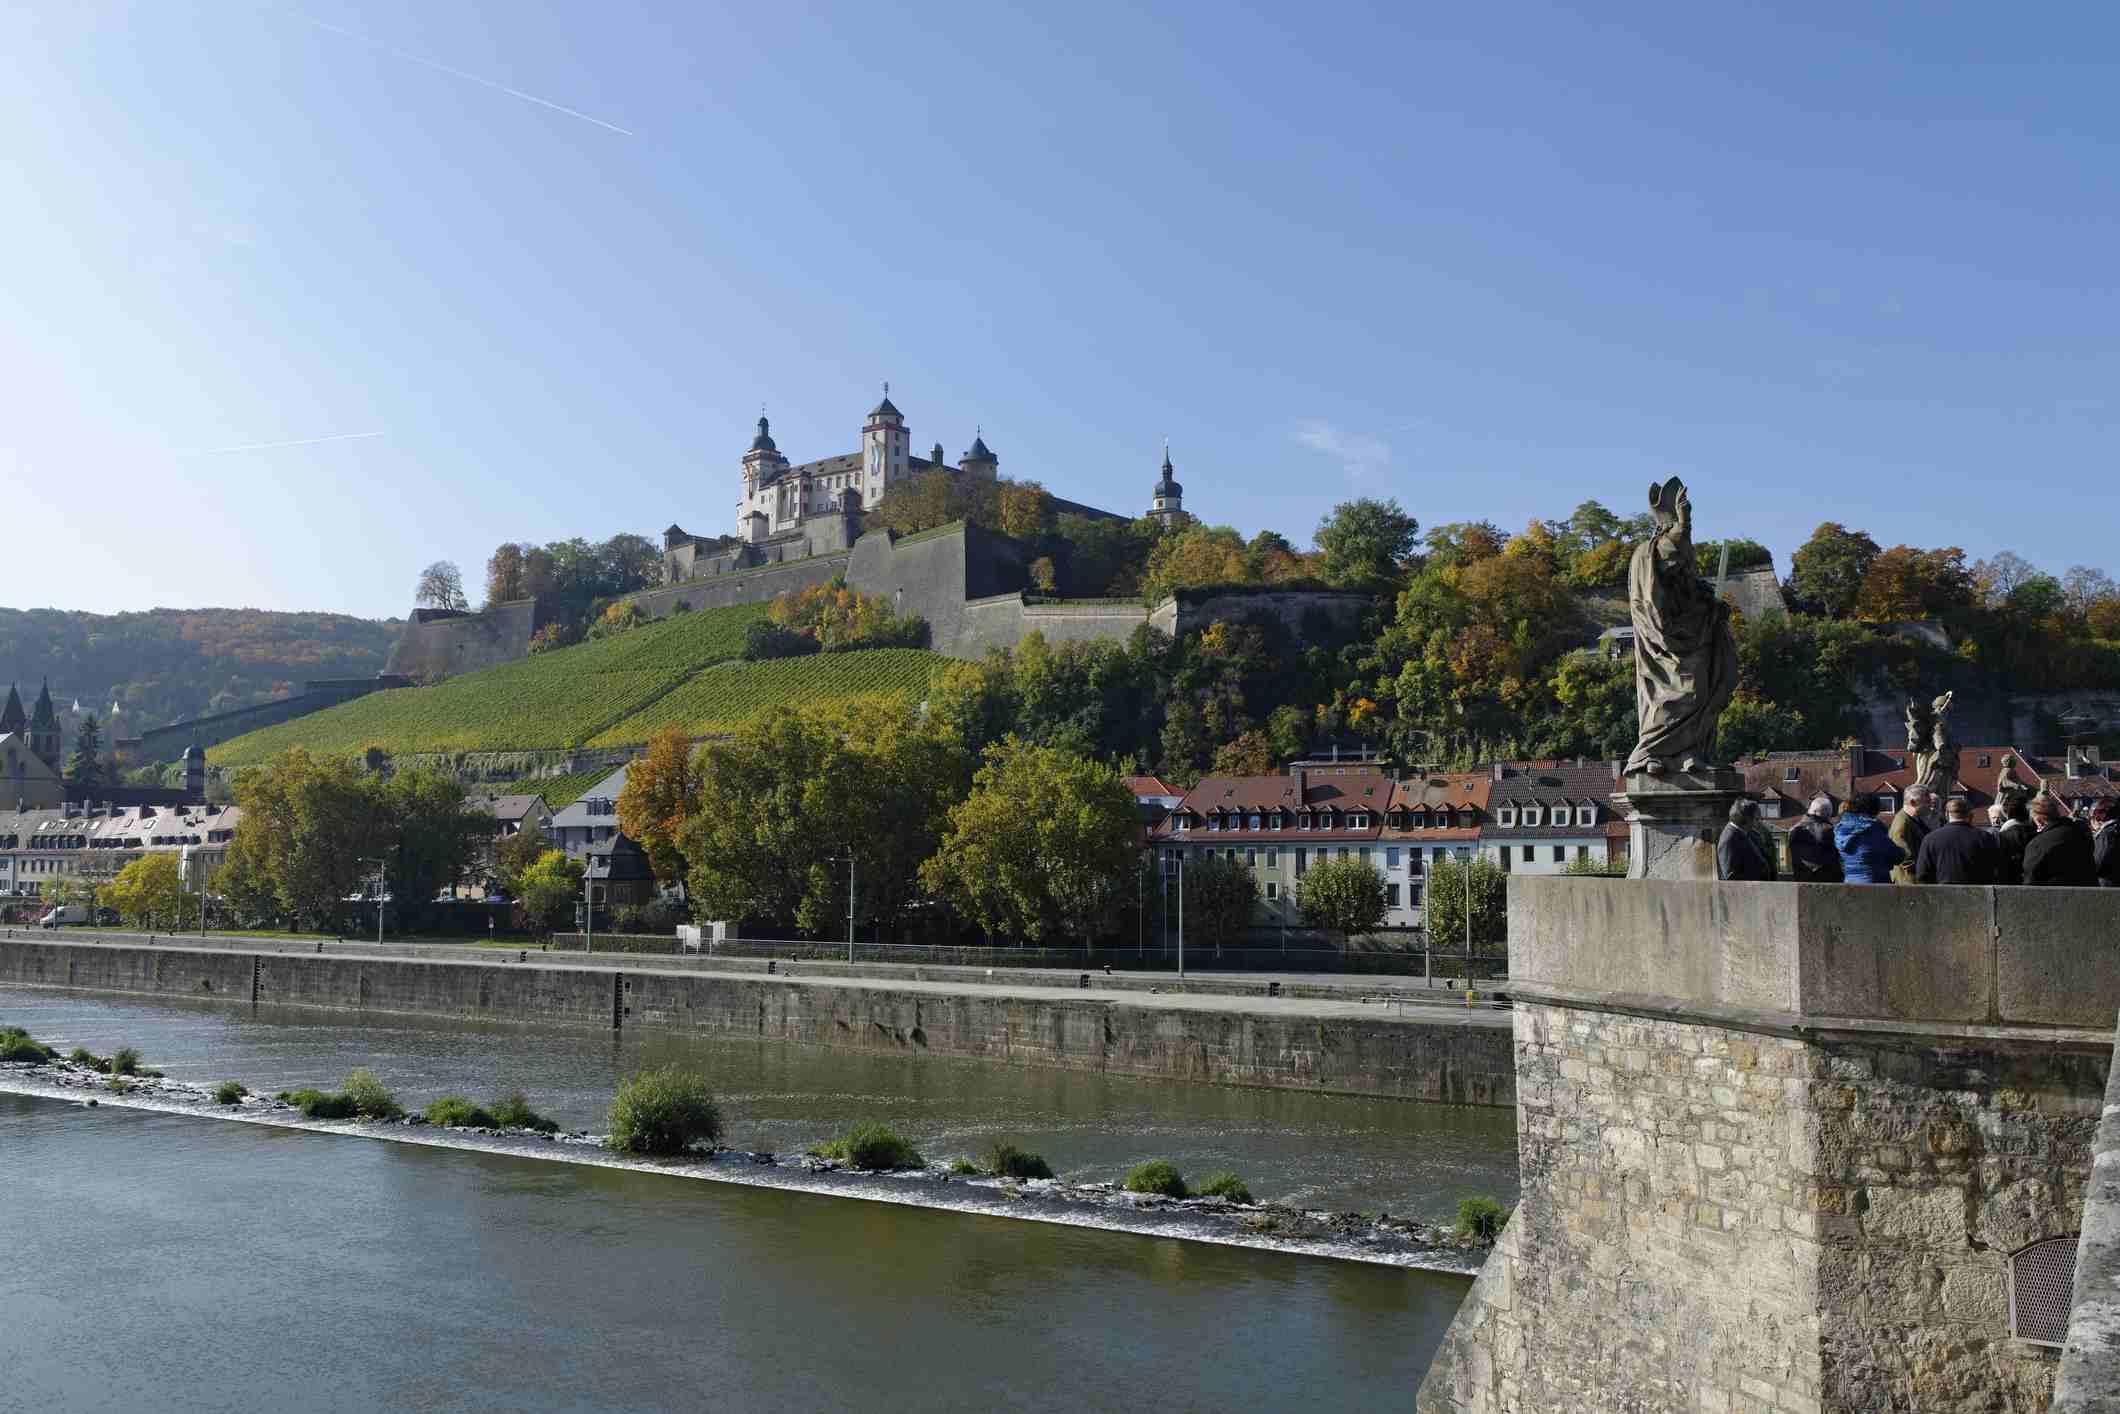 Germany, Bavaria, Wurzburg, Marienberg fortress